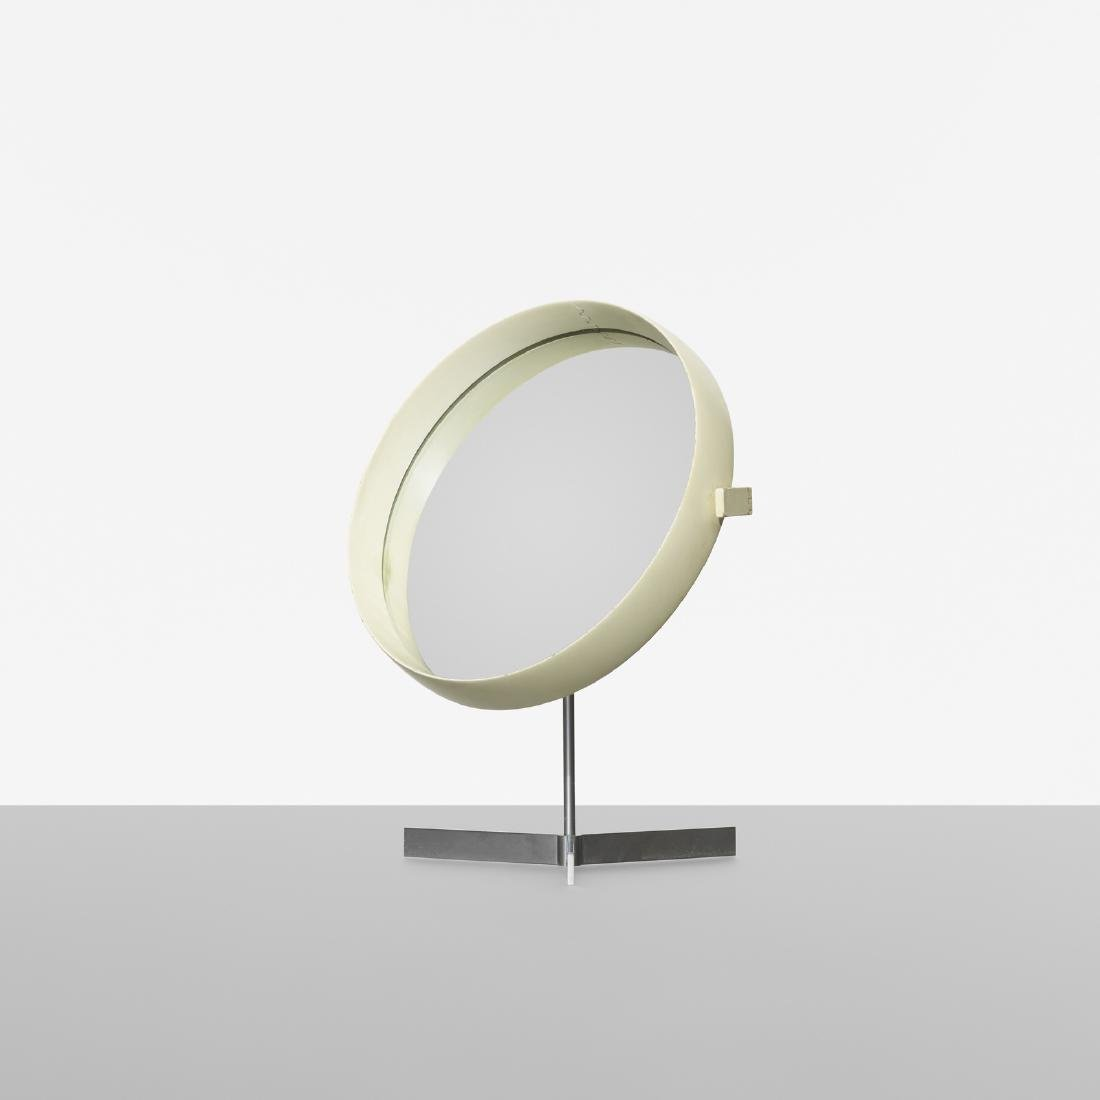 Uno and Osten Kristiansson, table mirror